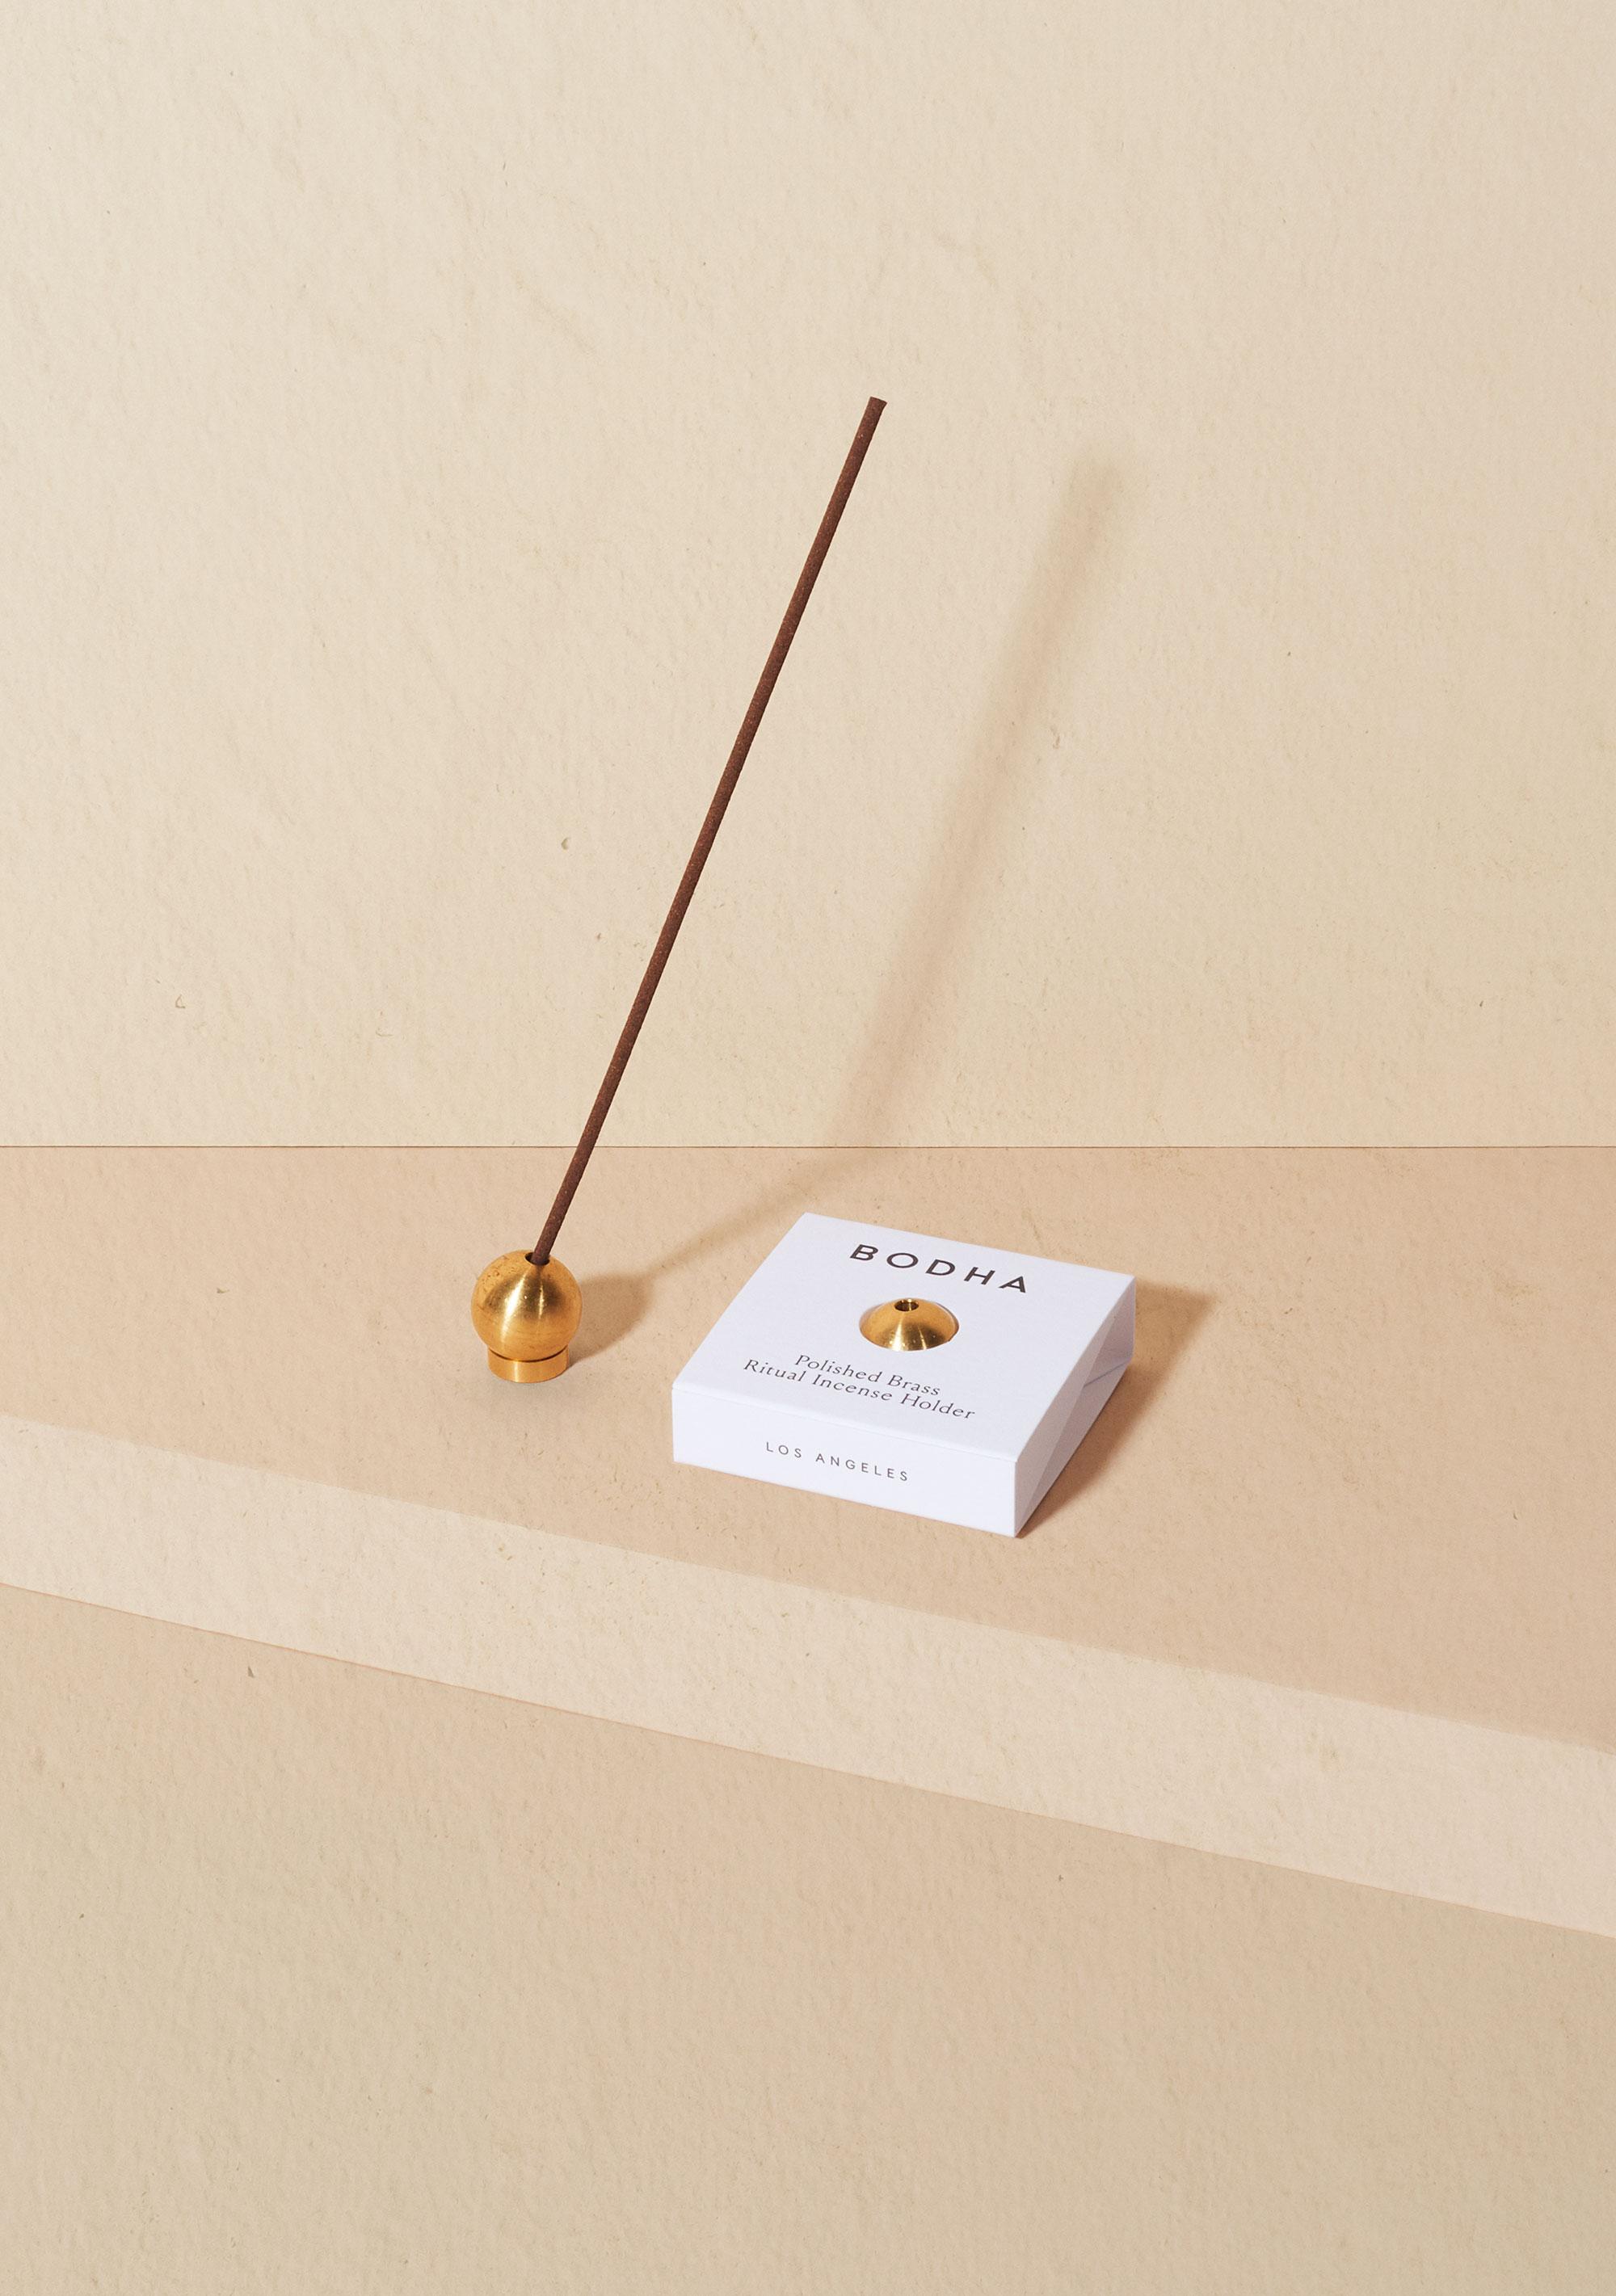 Bodha Ritual Incense Holder Brass